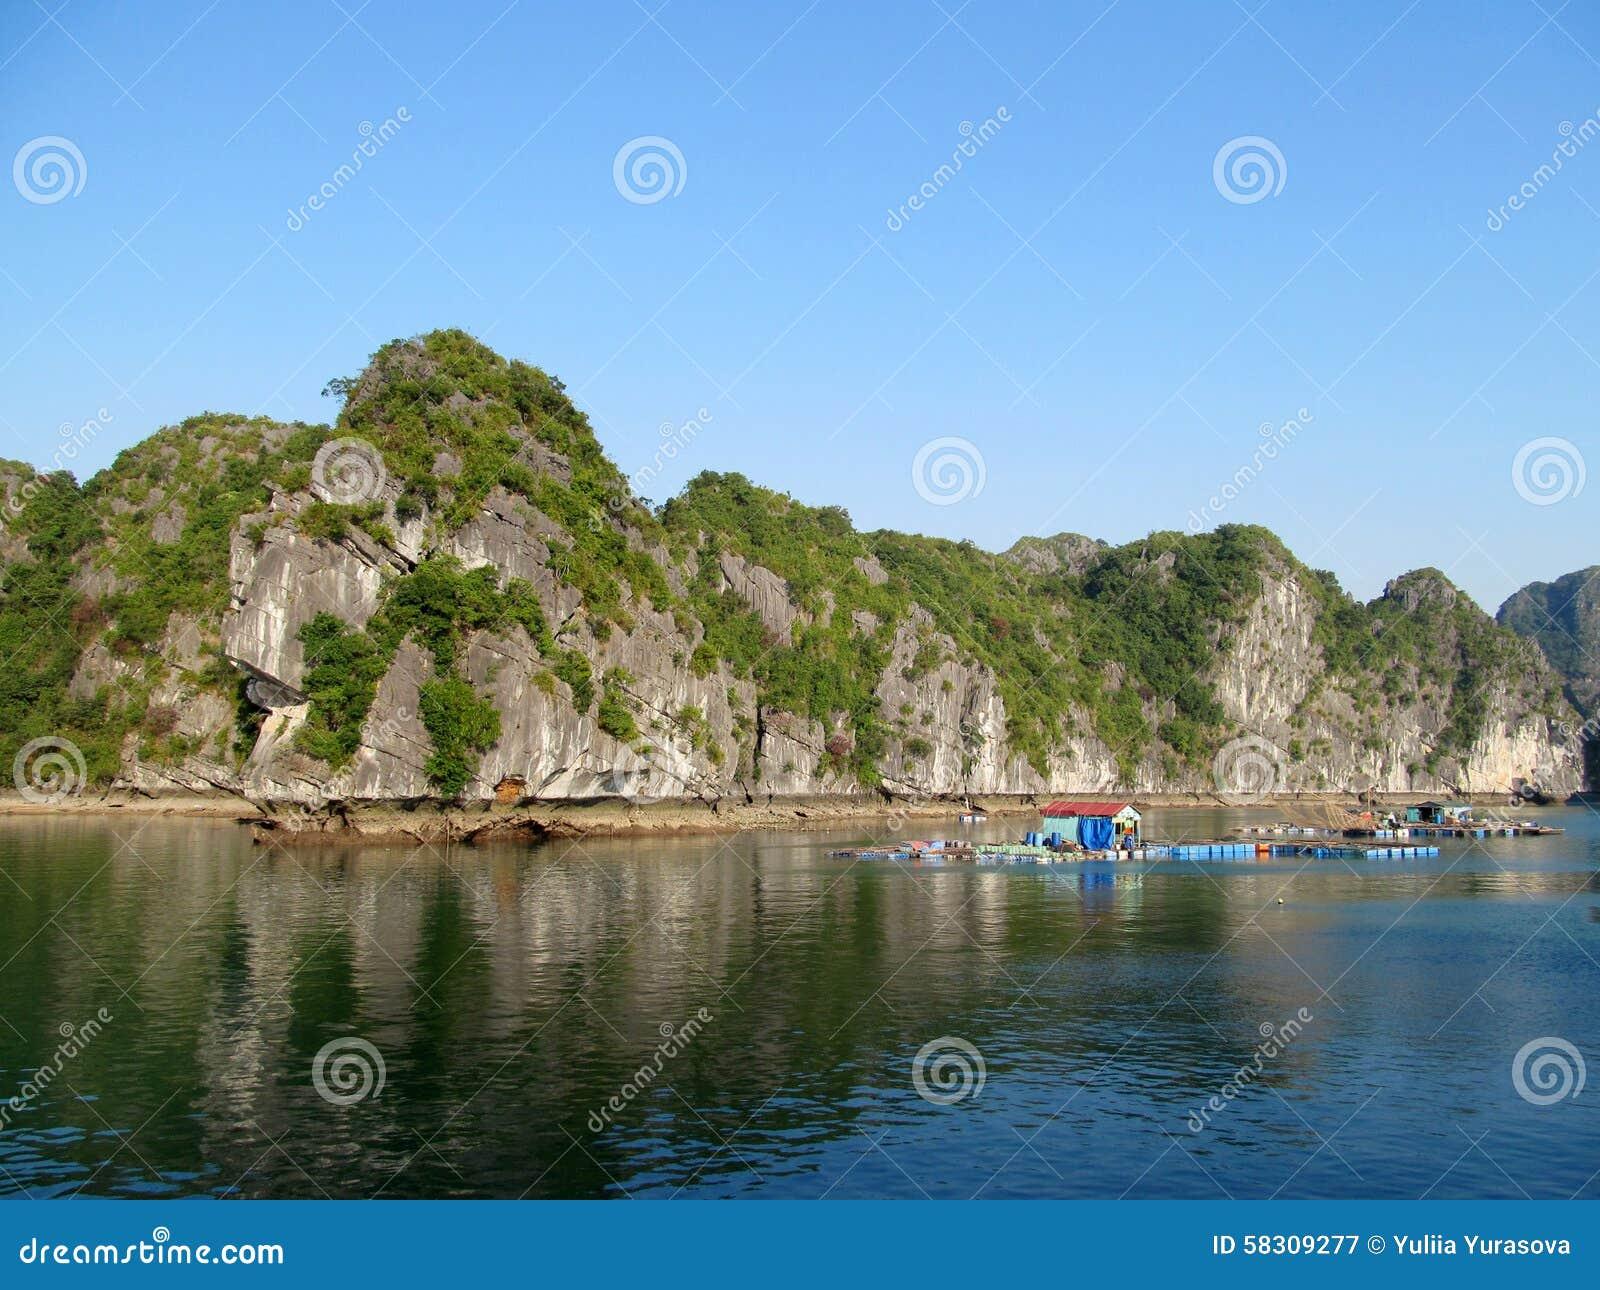 Fishing farm among limestone rocks in the sea